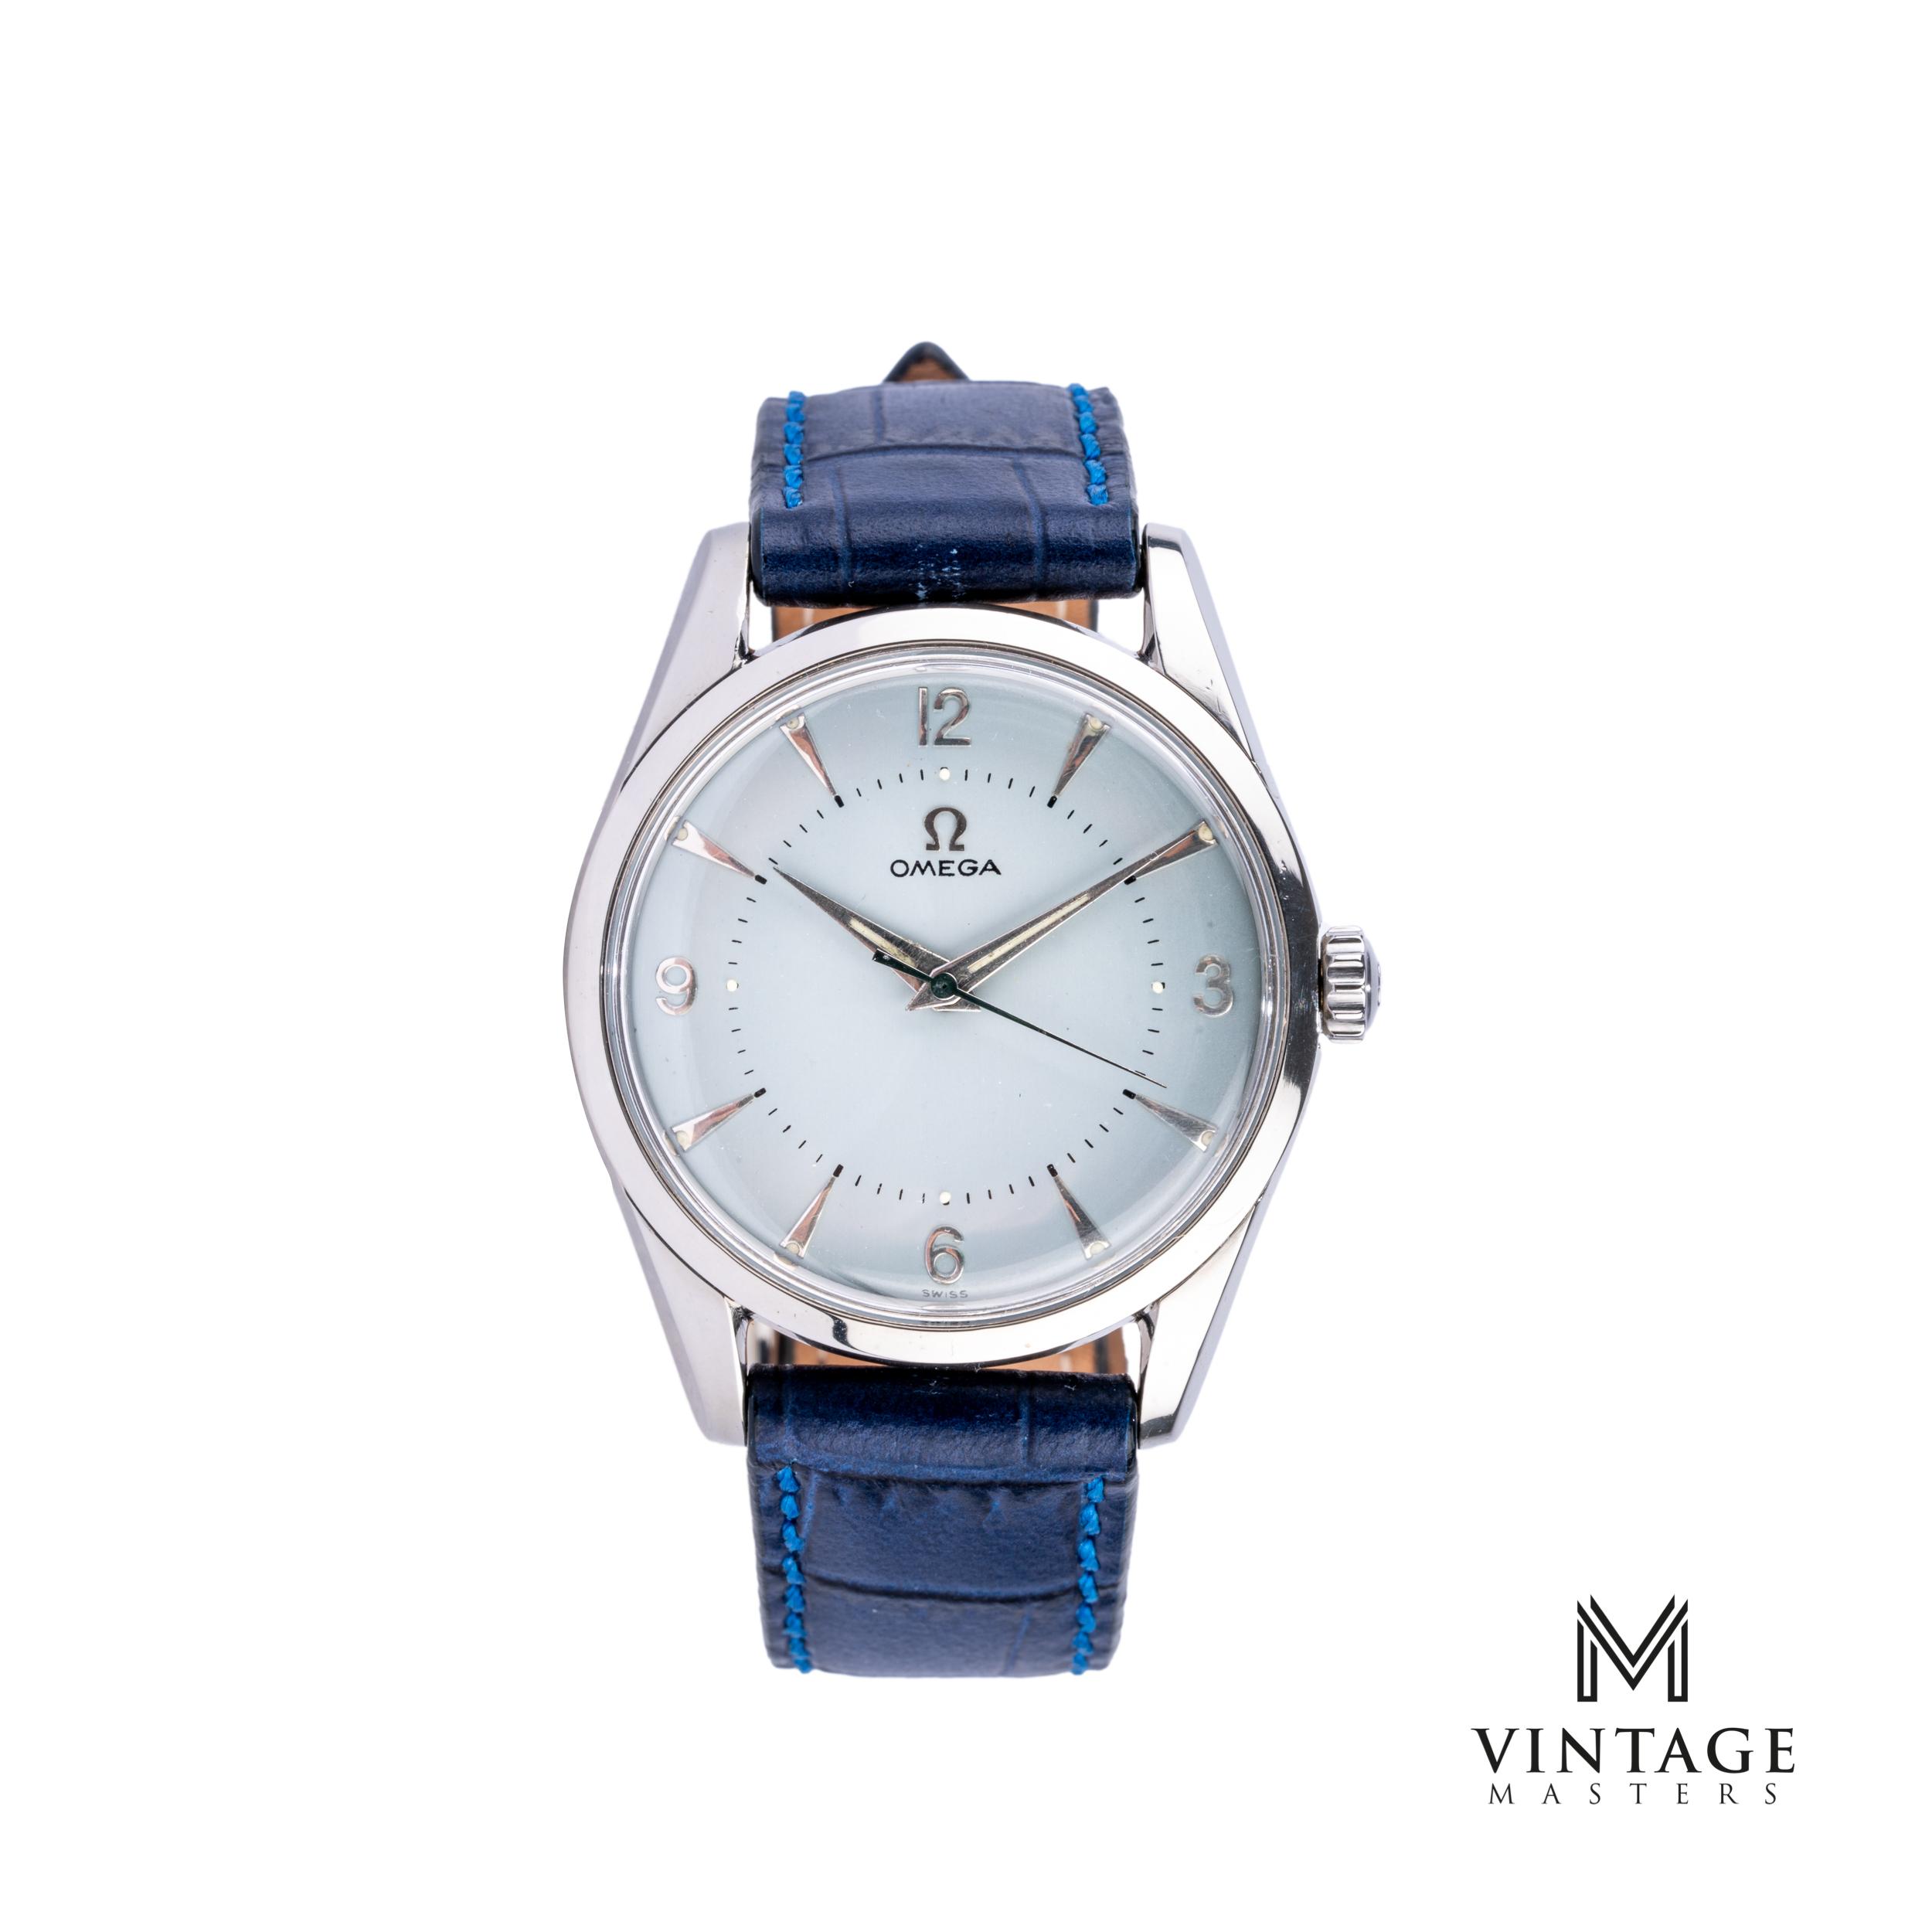 vintage Omega Seamaster watch. Blue Dial 2938-2 SC 1956 front